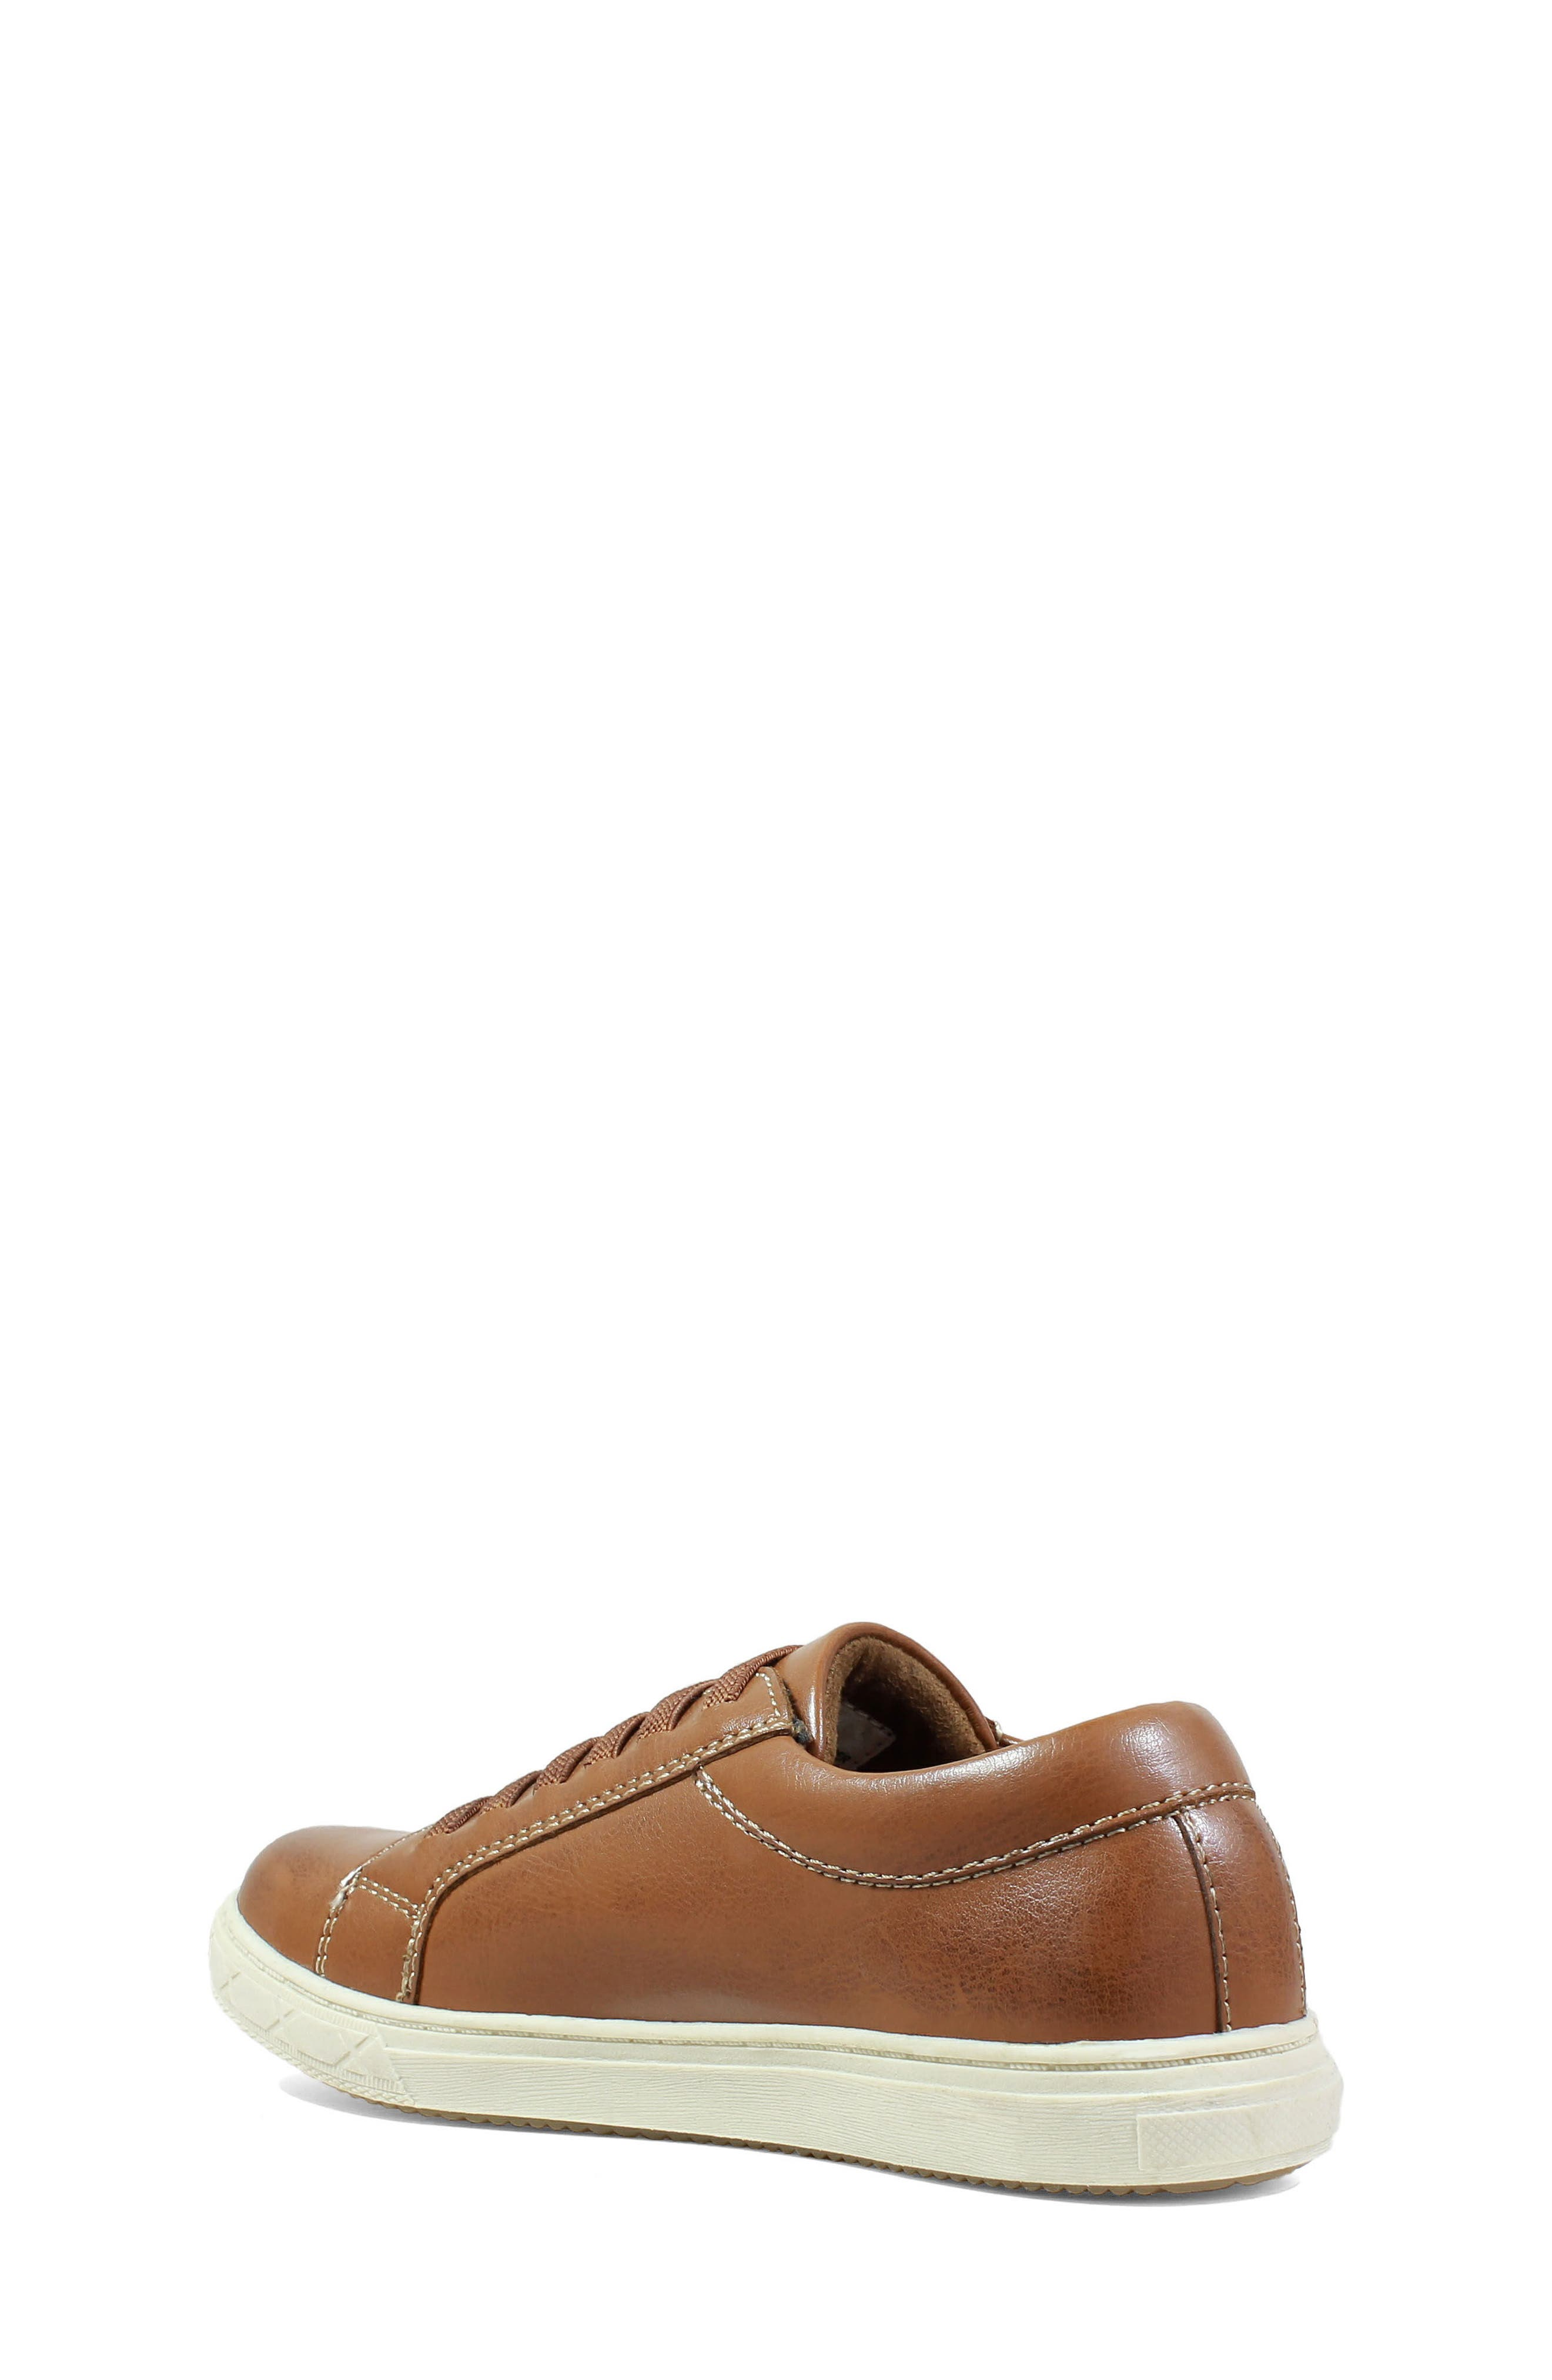 Curb Elastic Lace Sneaker,                             Alternate thumbnail 2, color,                             Cognac